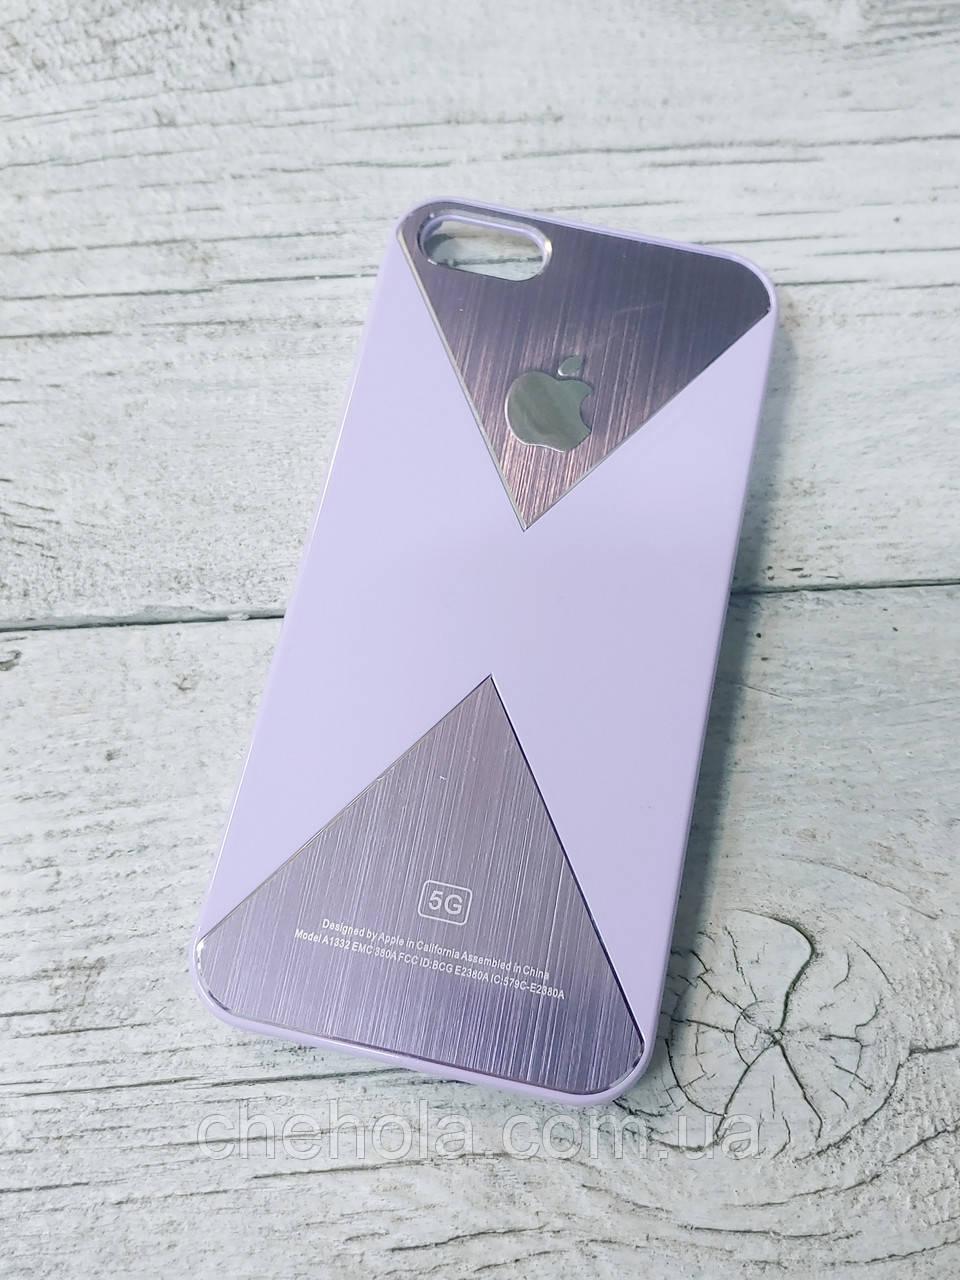 Протиударний Чохол для Iphone 5 5S SE Juicy Triangle Фіолетовий